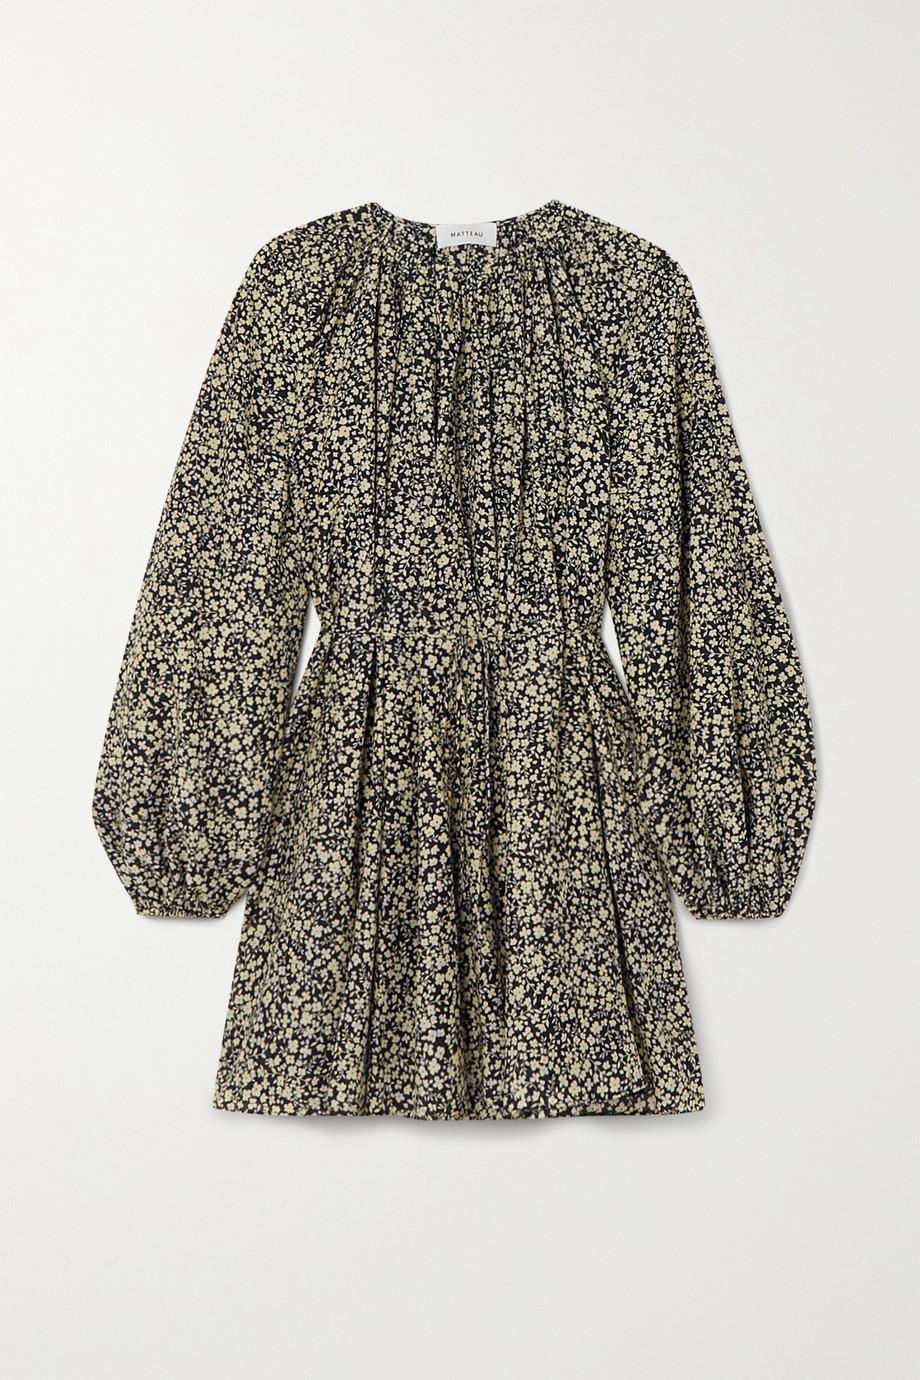 Matteau + NET SUSTAIN floral-print organic cotton and silk-blend mini dress